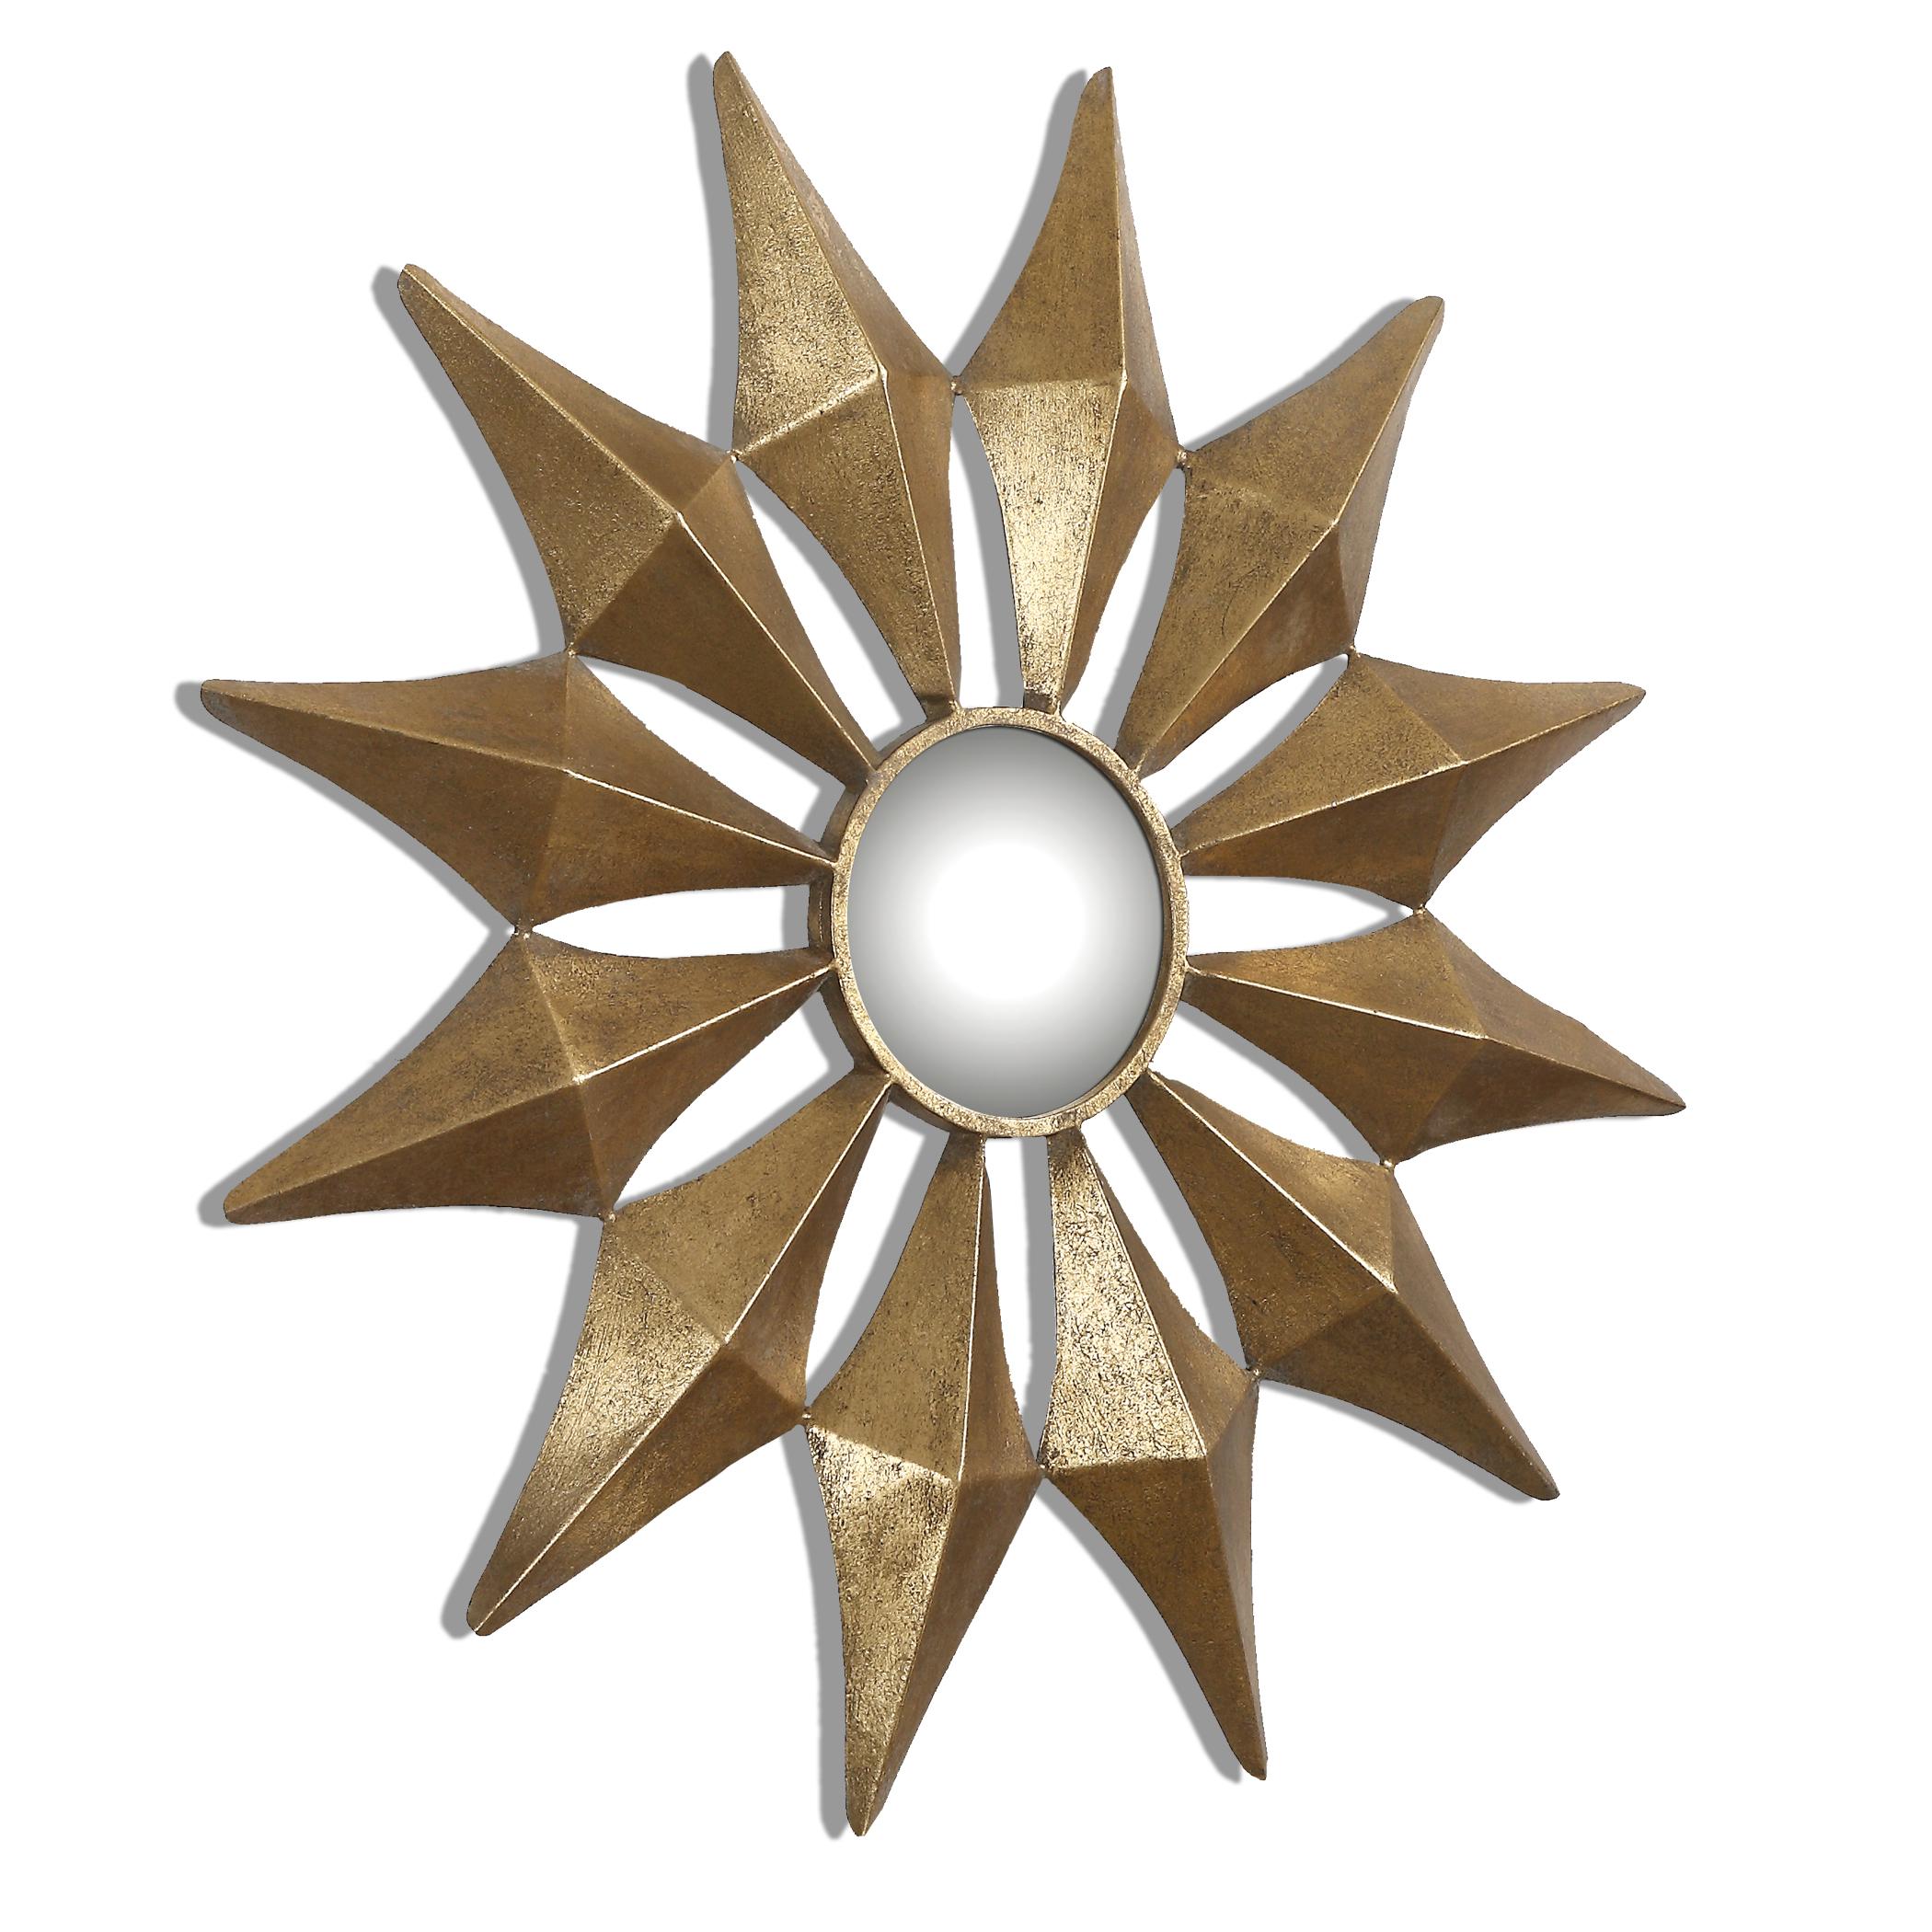 Uttermost Mirrors Navia Gold Starburst Mirror - Item Number: 12932